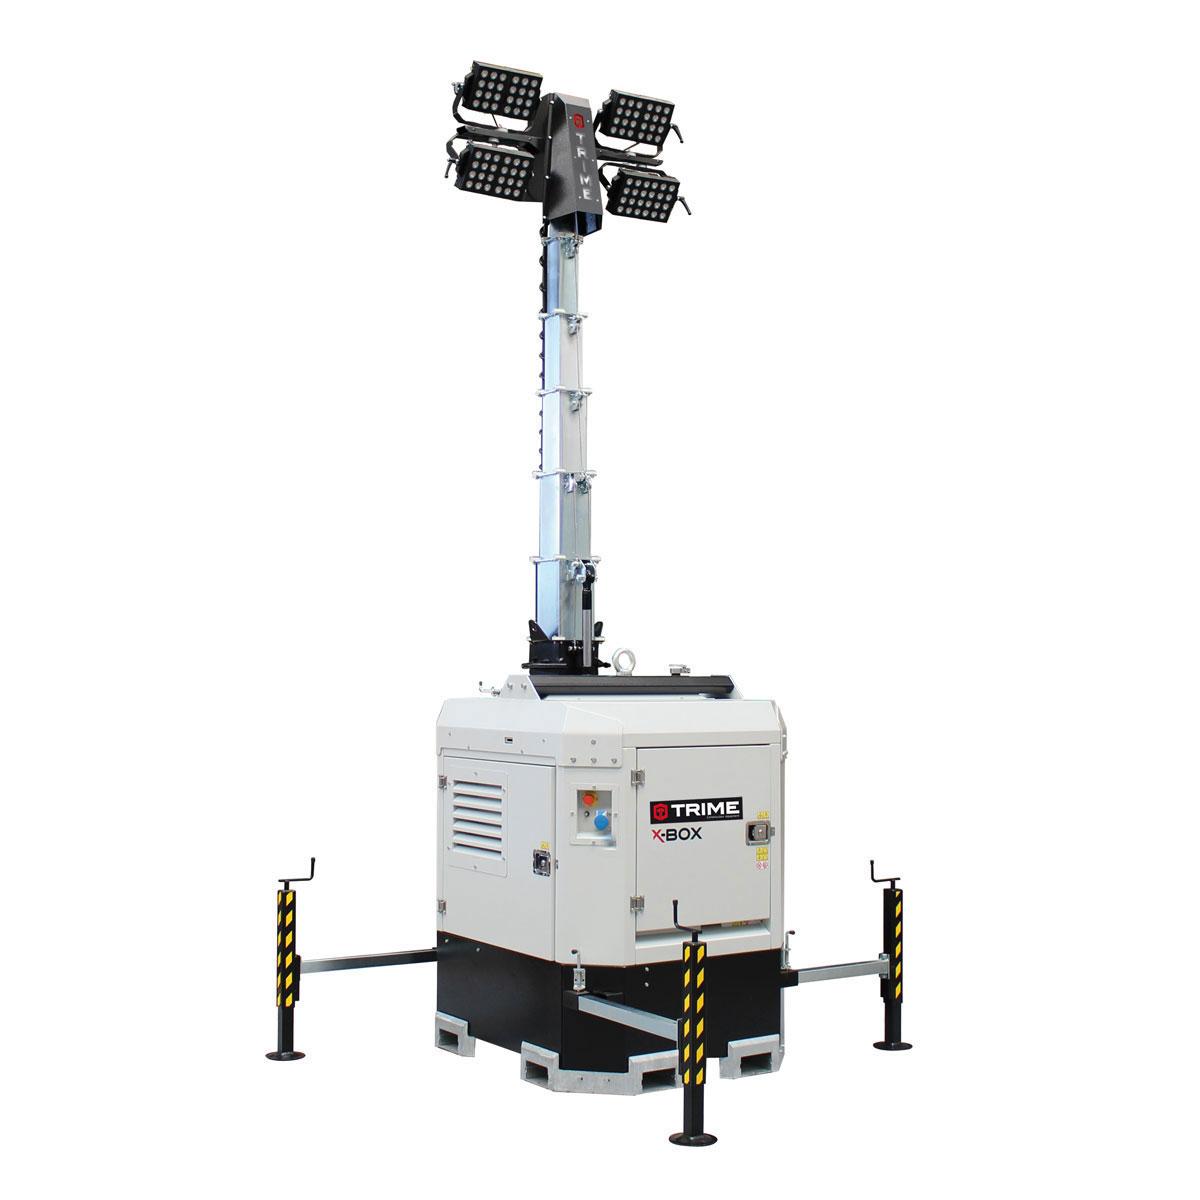 prozektoru-masts-led-x-box-4x300W-48V-atverta-pozicija